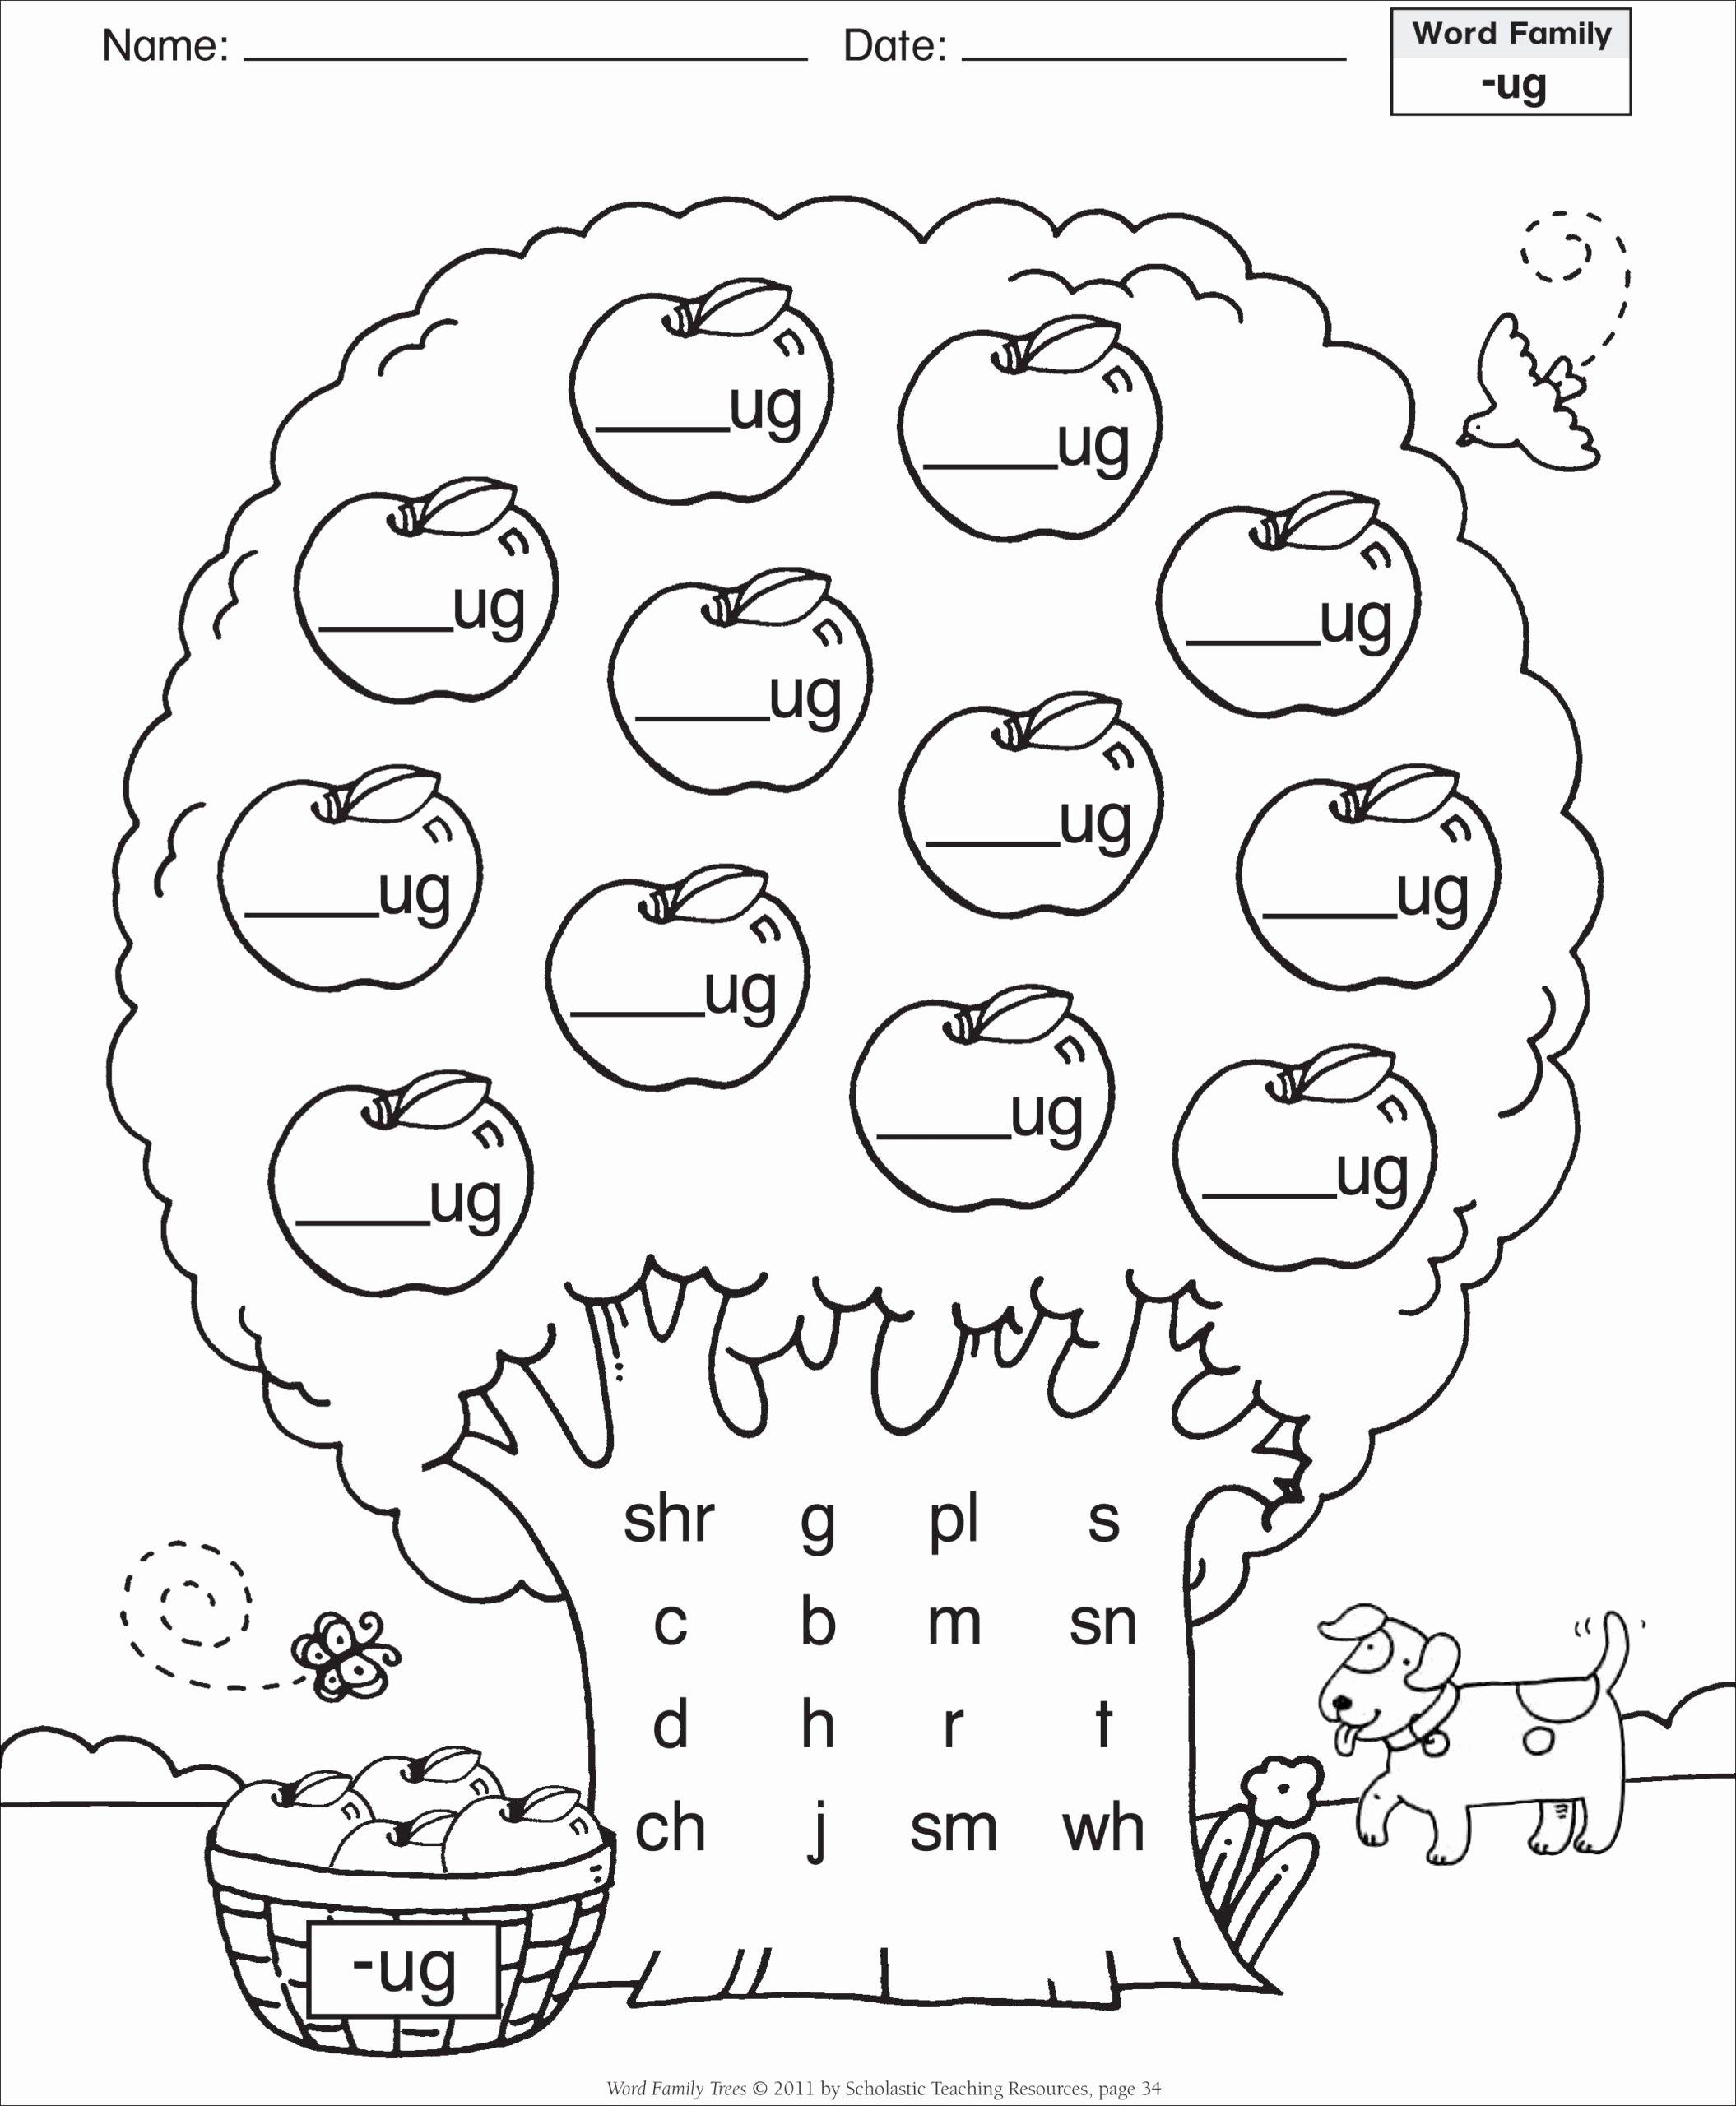 Alphabets Worksheets for Preschoolers Fresh Worksheets Alphabet Writing Worksheets Kindergarten